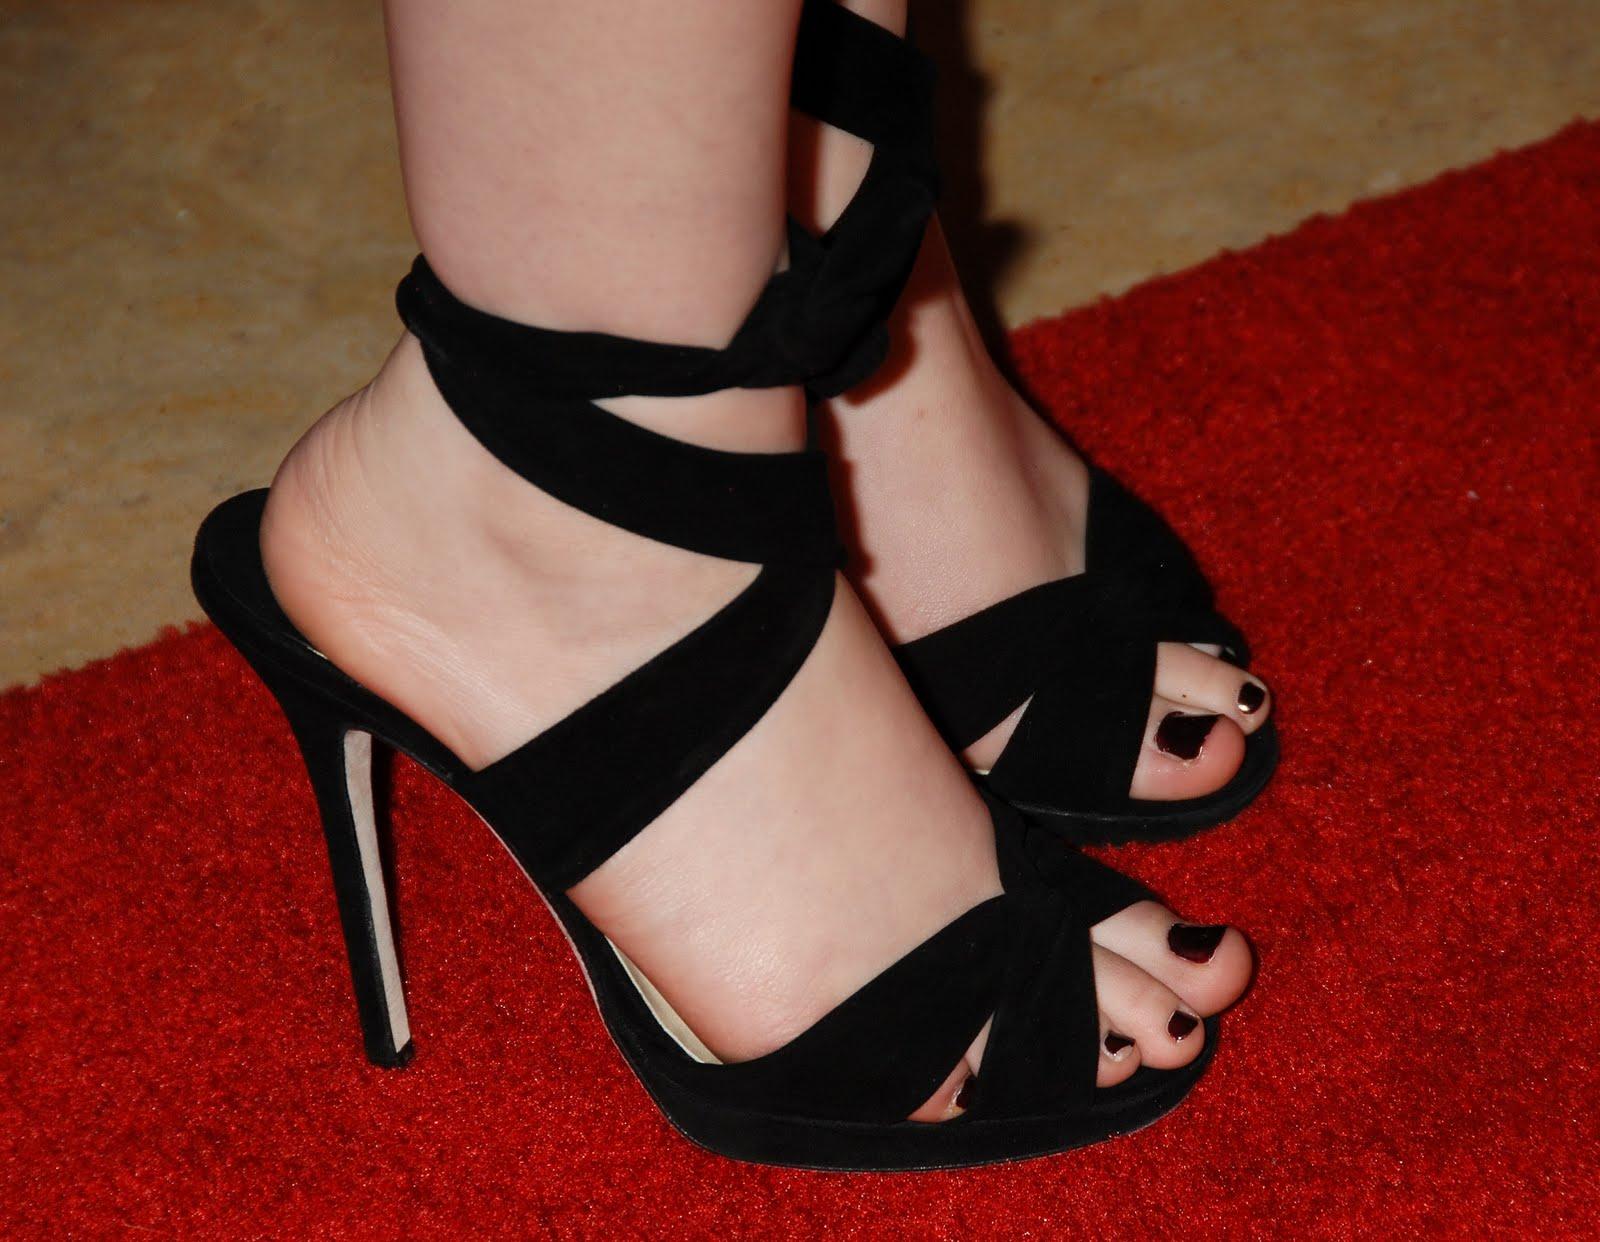 http://3.bp.blogspot.com/_UaLWp72nij4/S-R6UoKmV7I/AAAAAAAAKJ4/hkUZkYb9q1w/s1600/kat-dennings-feet-4.jpg